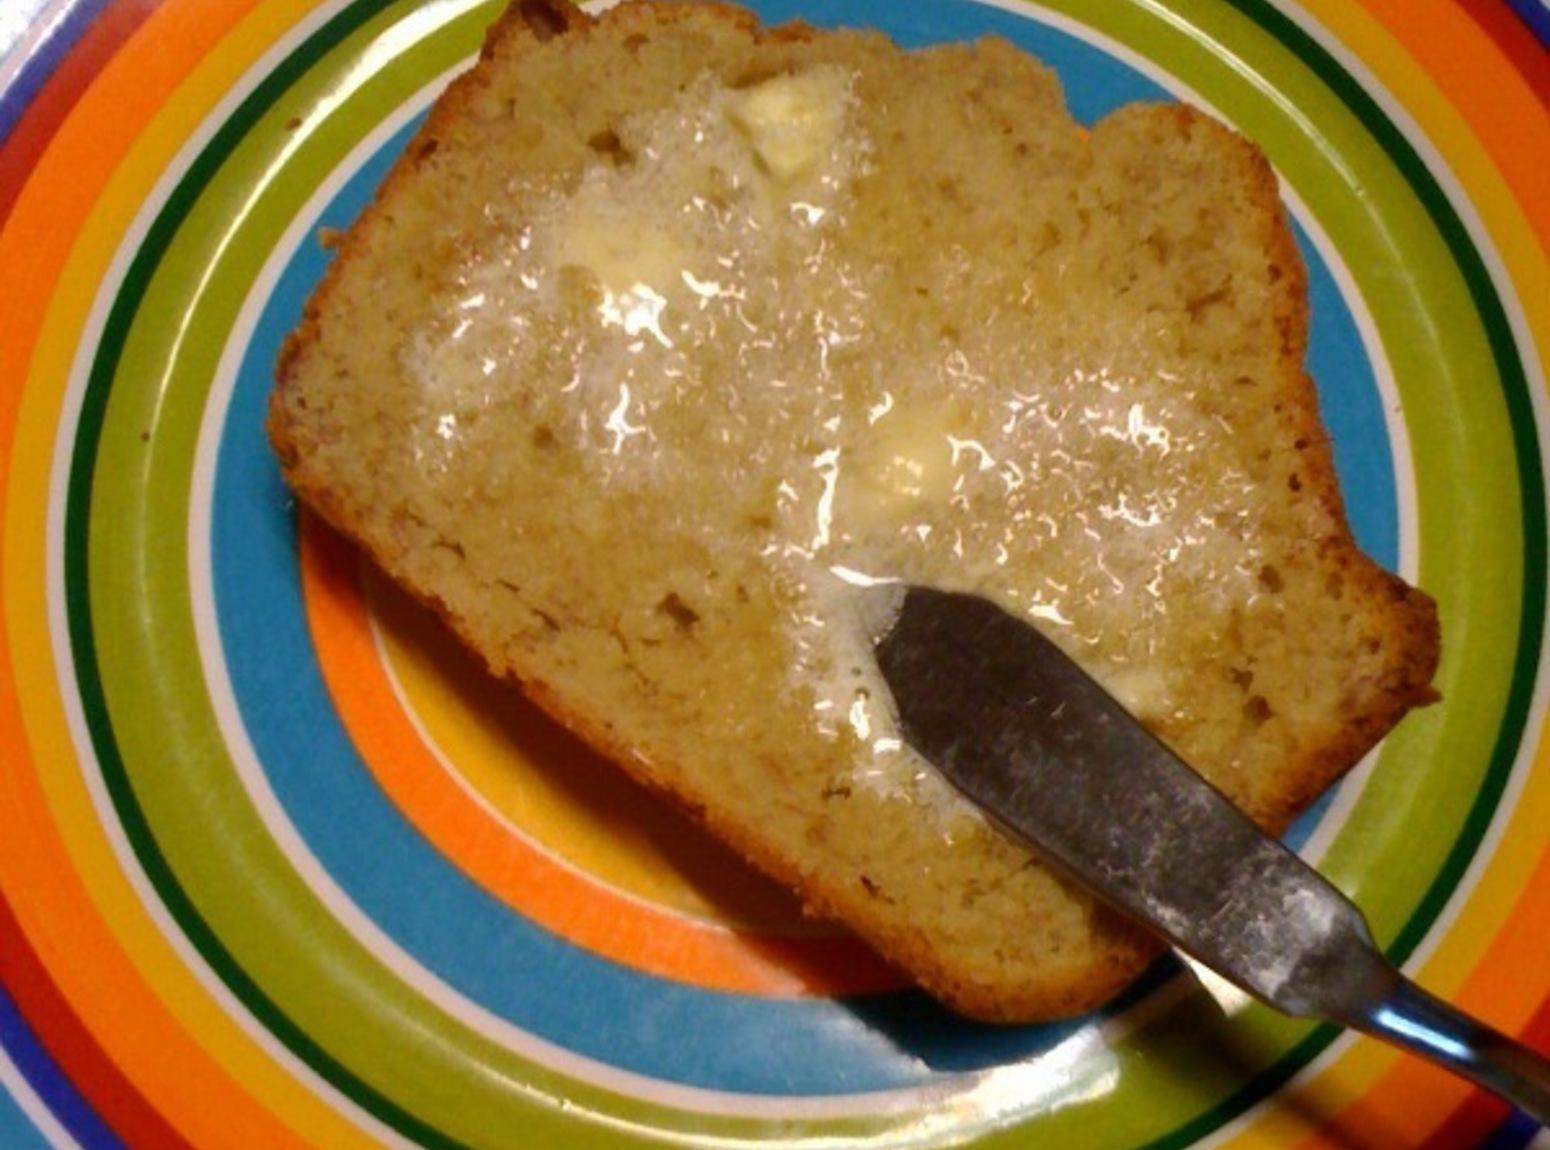 Sour Cream Banana Bread Recipe 2 | Just A Pinch Recipes